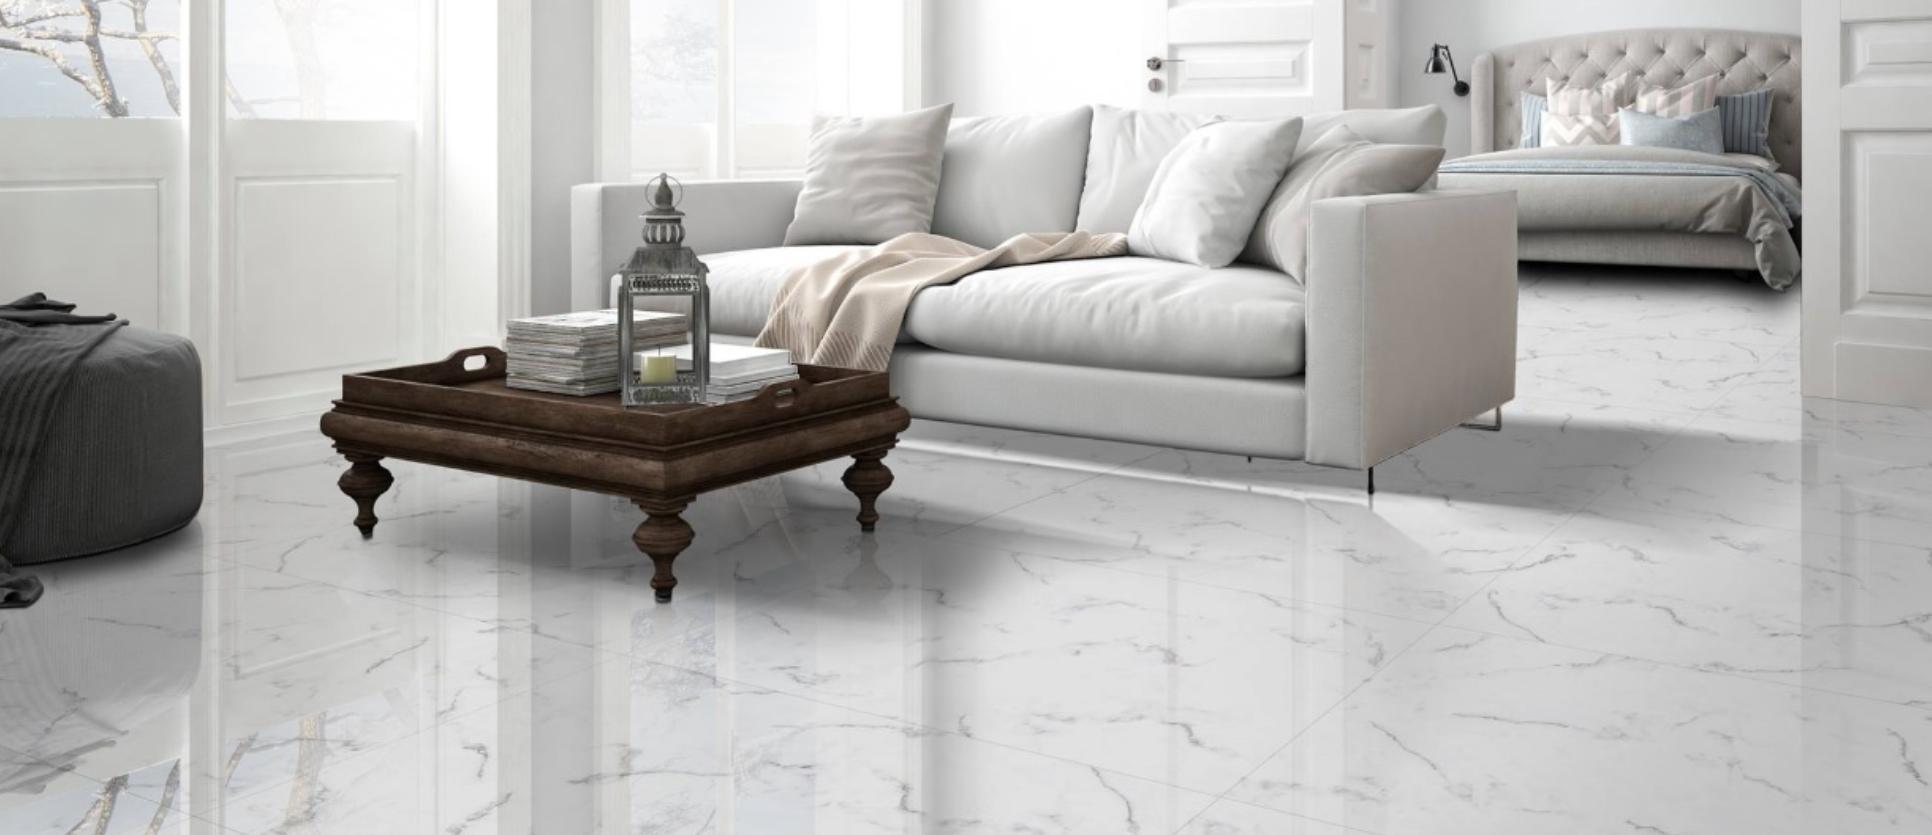 Miami Tile & Marble Showroom - Associates Tile Manufacturing